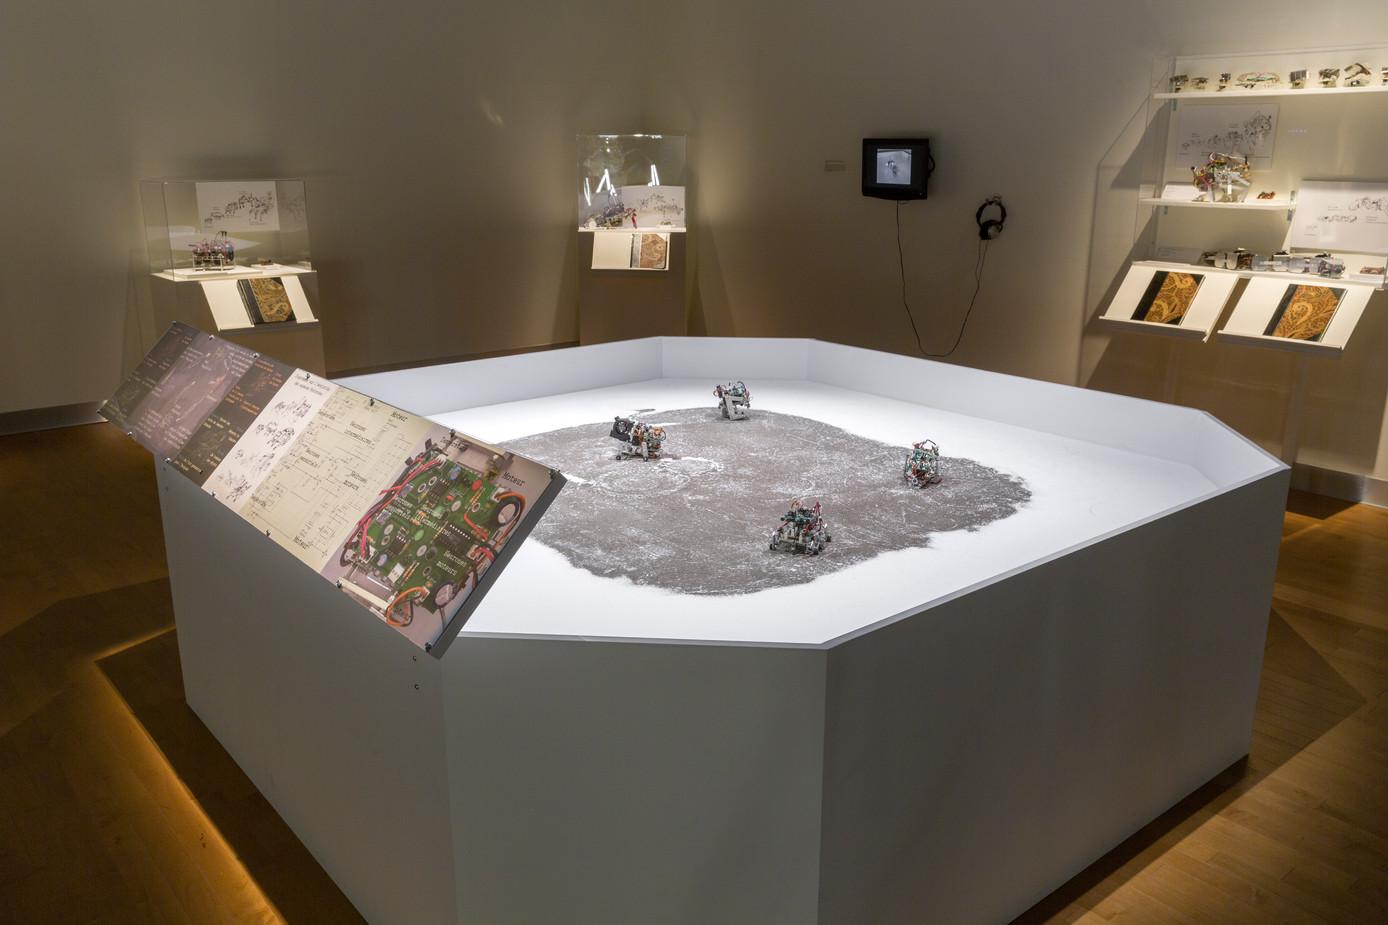 Field Studies V2 as a Museum Exhibit